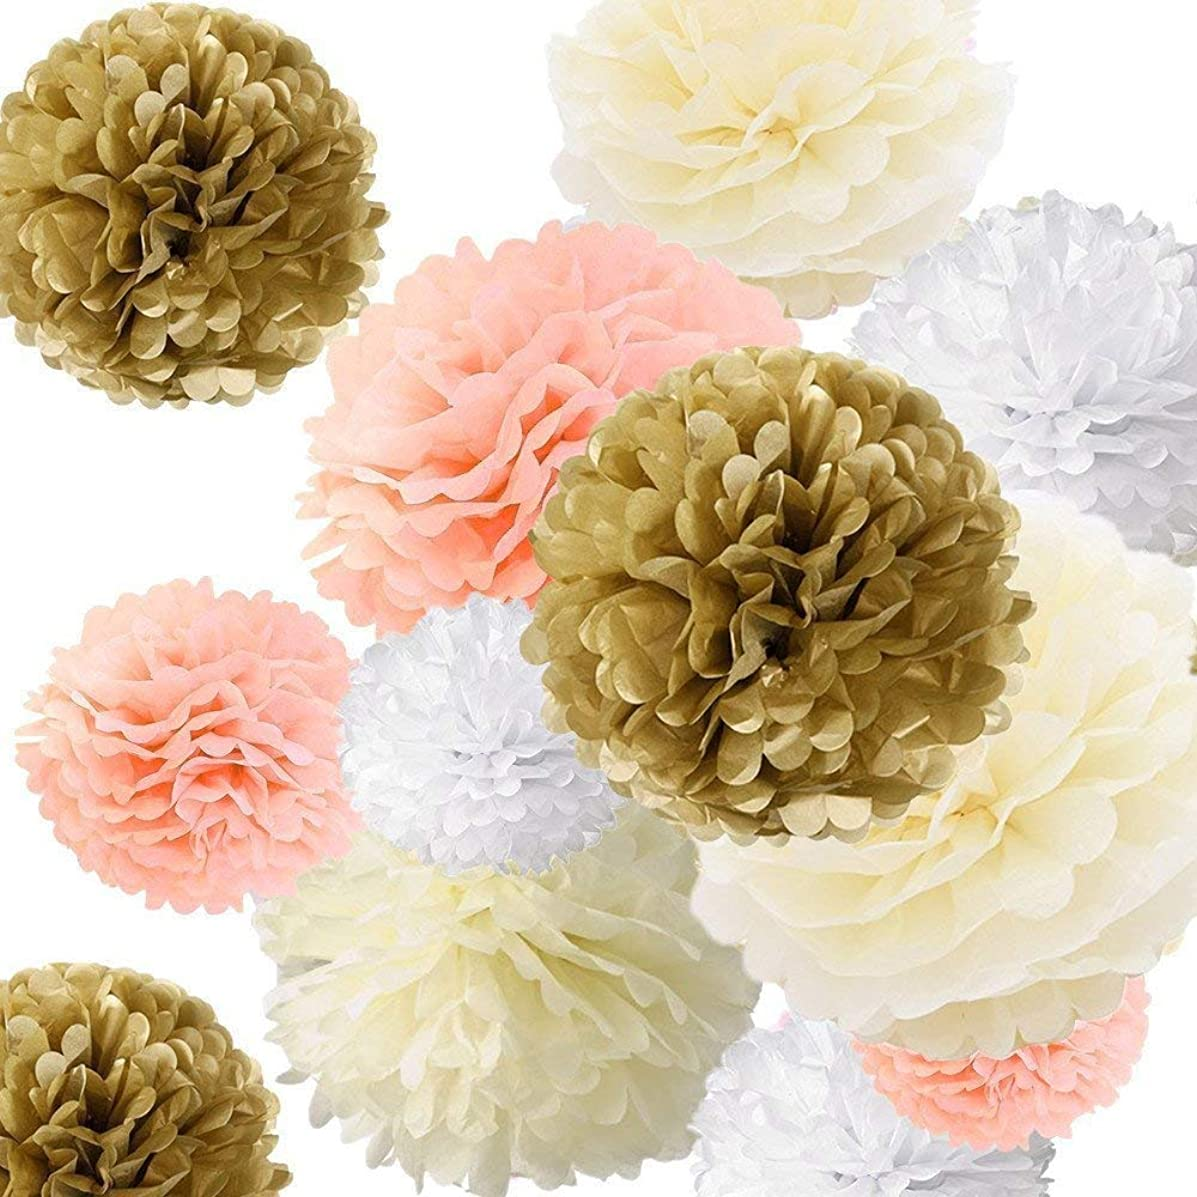 Fonder Mols Tissue Pom Paper Flowers Decorations Set for Baby Shower Birthday Wedding Bridal Shower Nursery Wall Backdrop (Champagne Peach Ivory White, Set of 24)